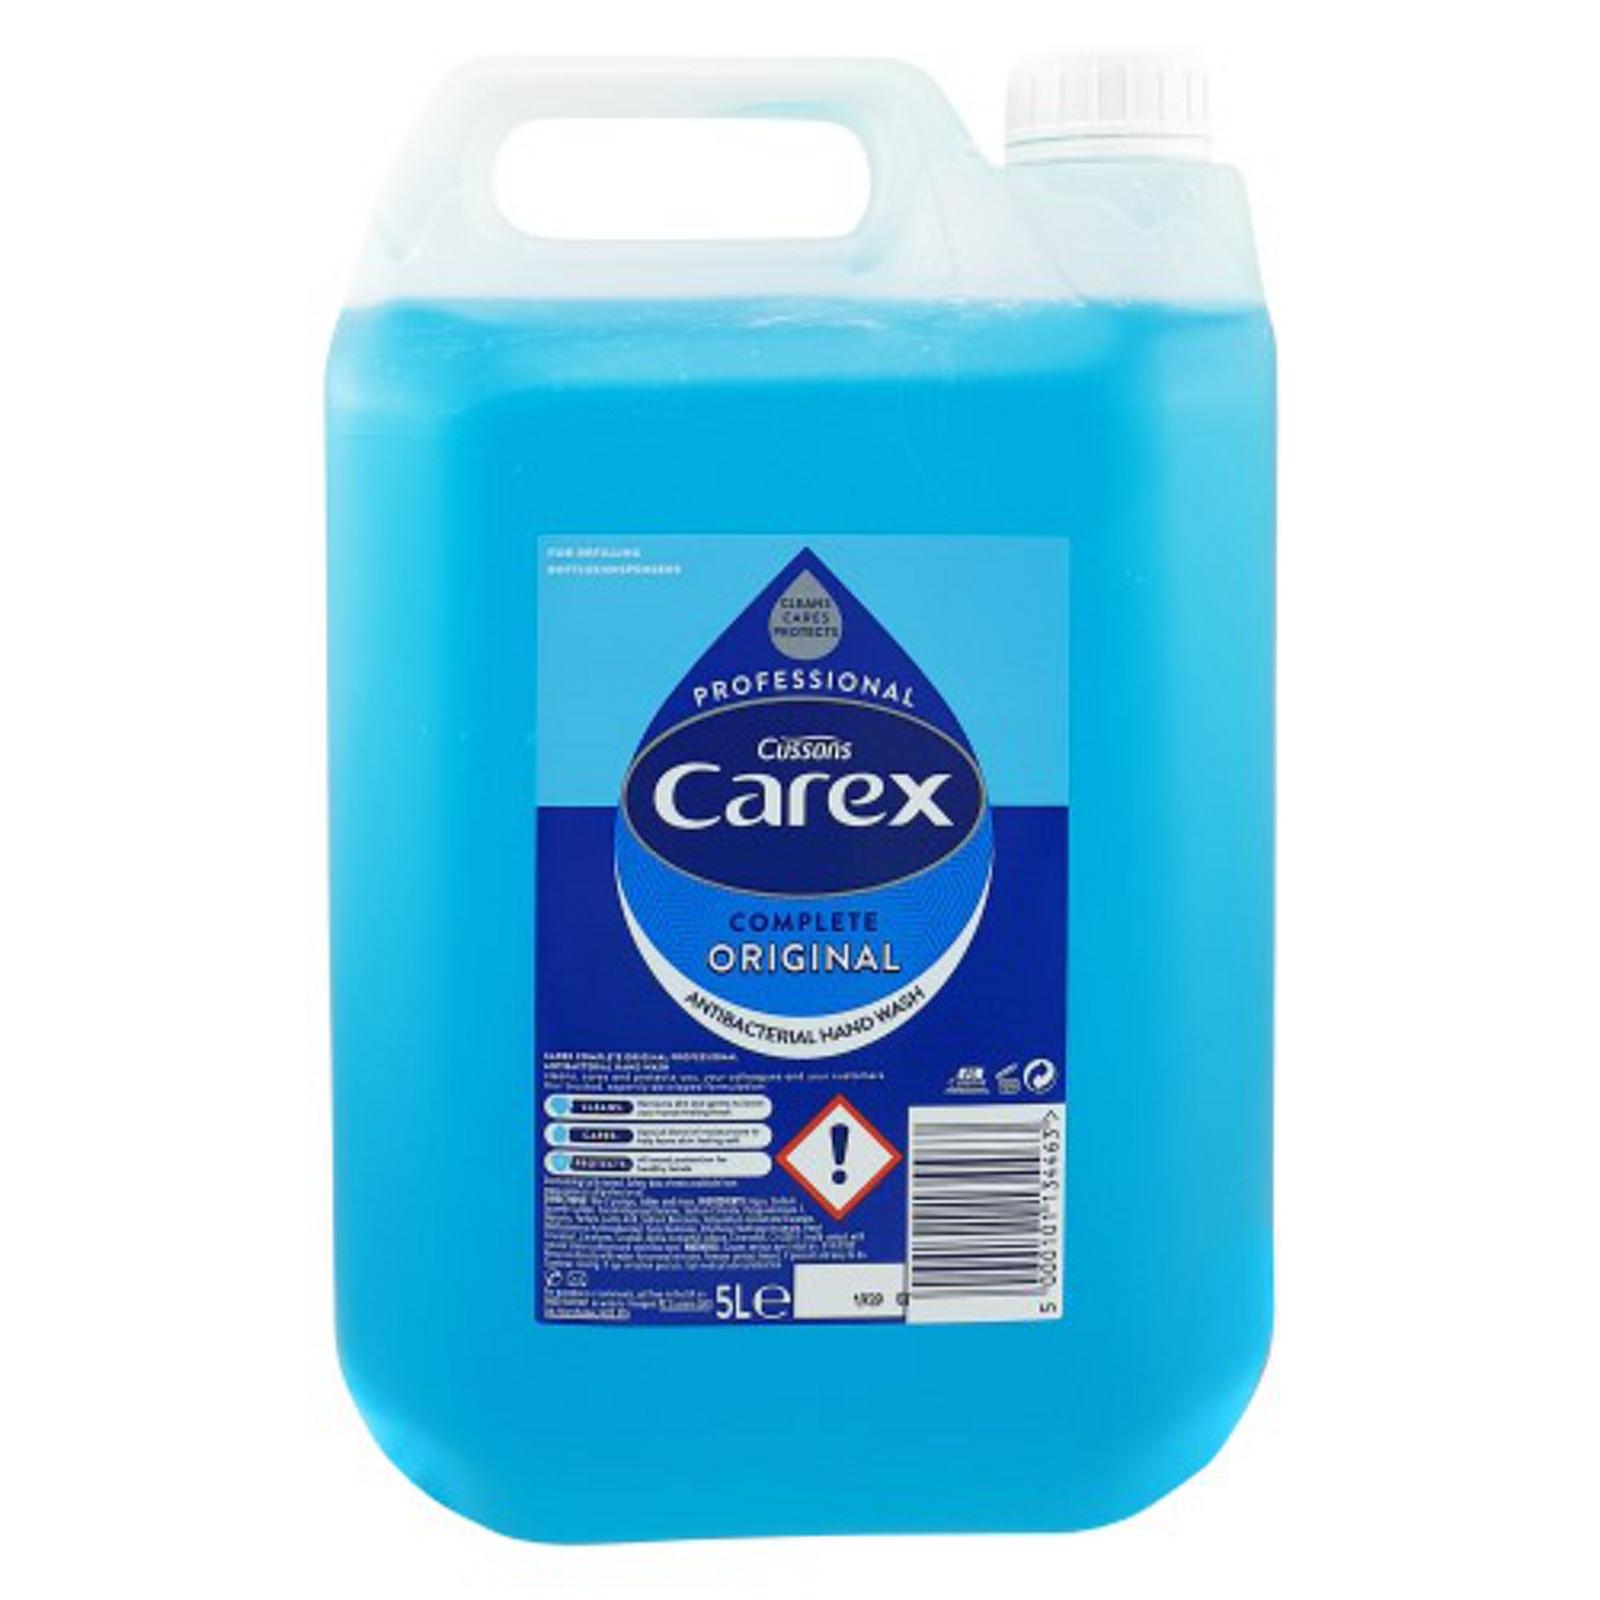 Carex Professional Hand Wash 2 x 5 litre